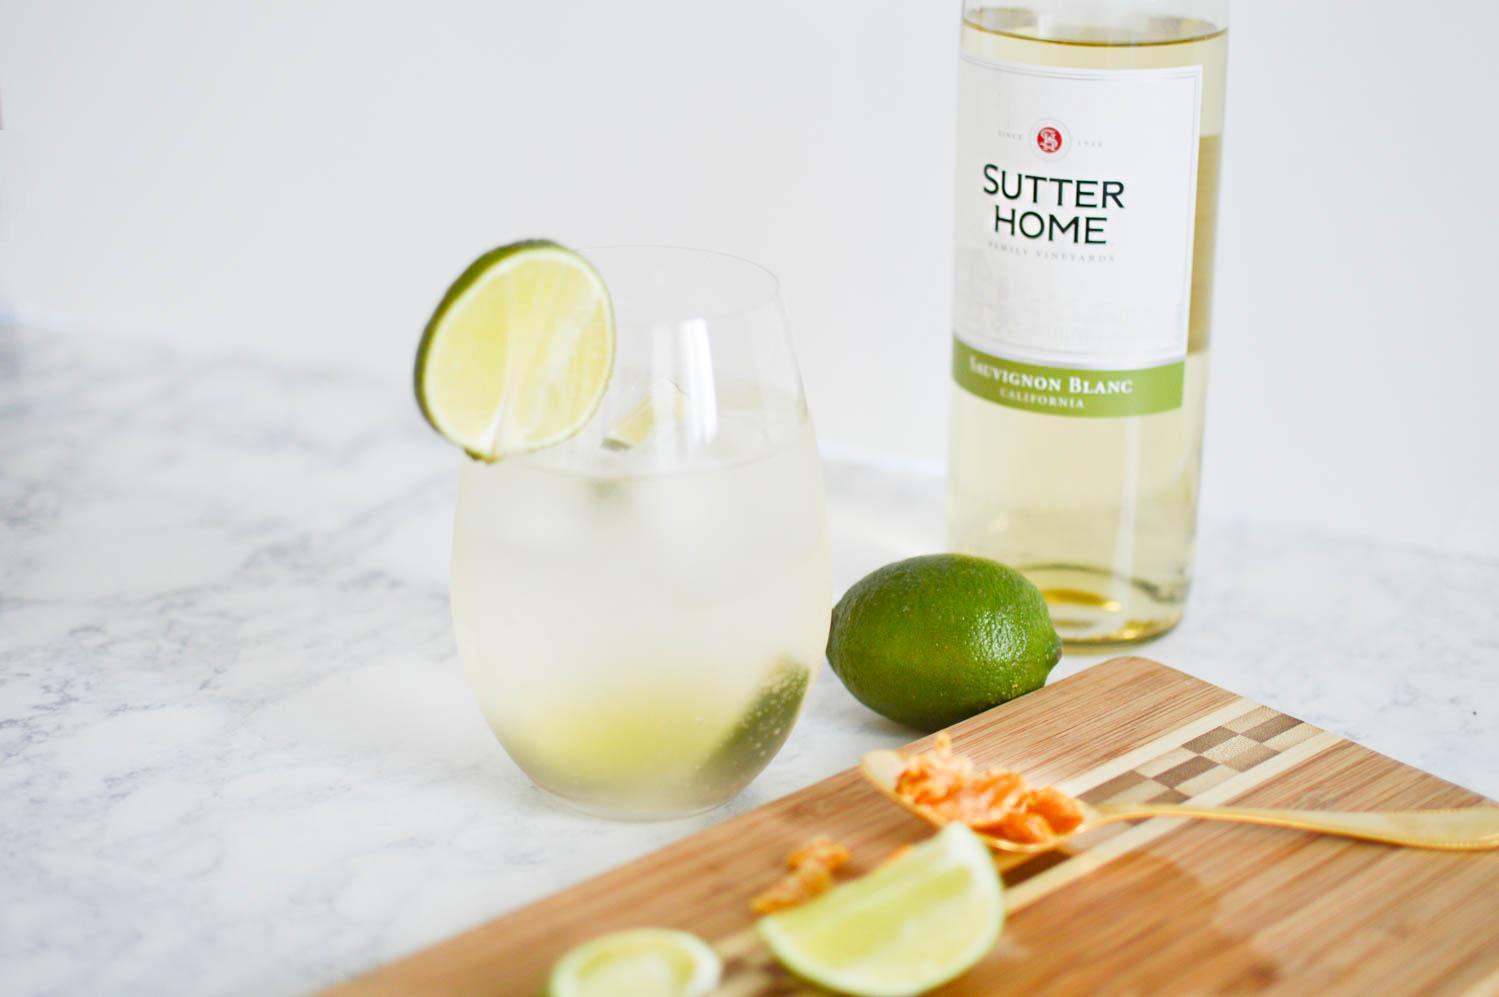 Summer Ginger Spritz with Sutter Home via. www.birdieshoots.com